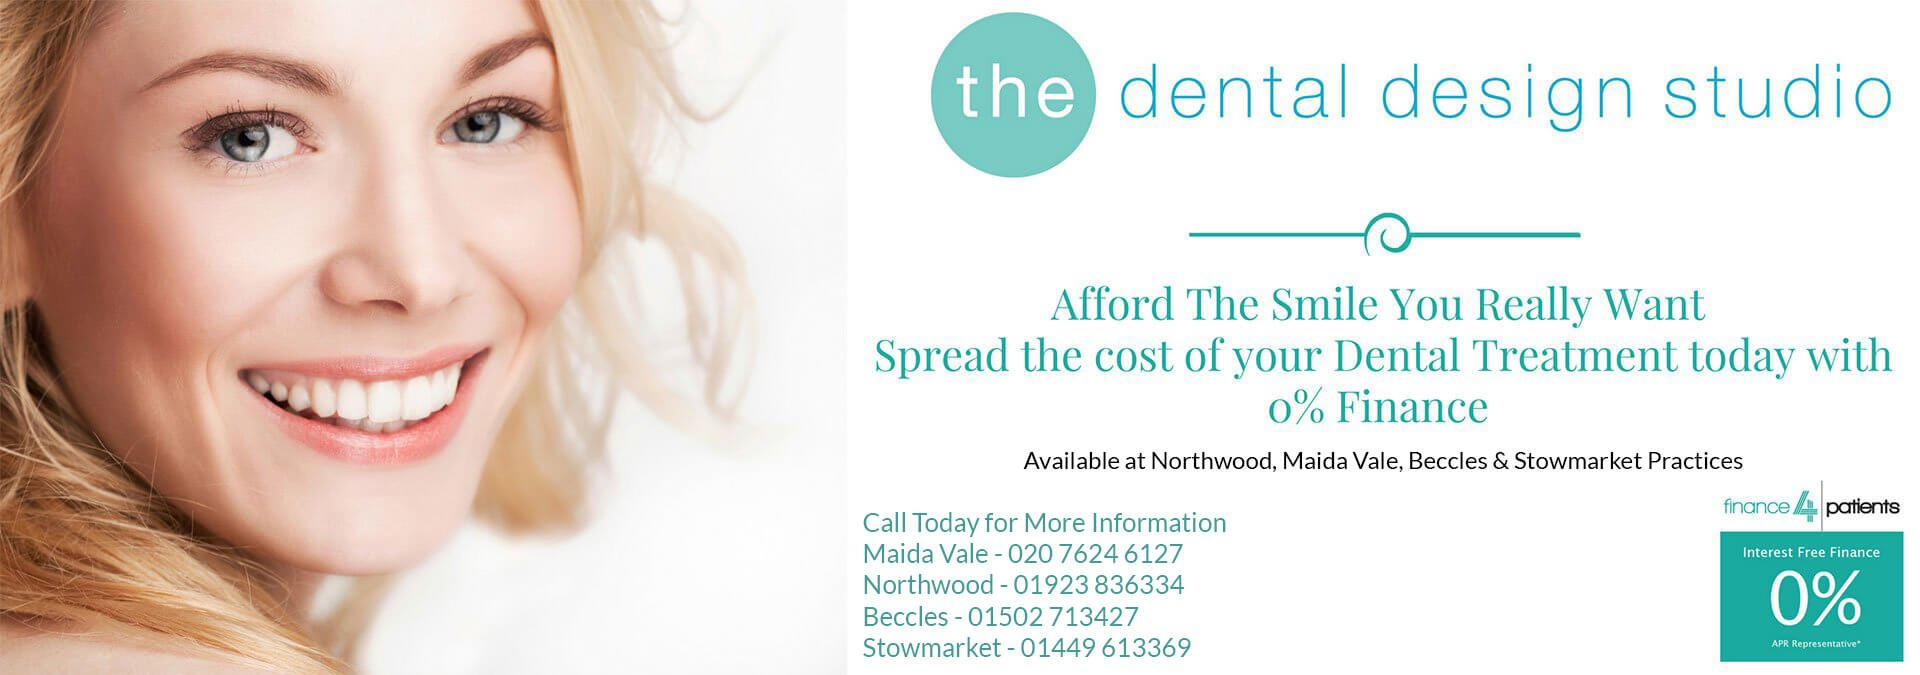 blonde woman smiling on dental design studio banner